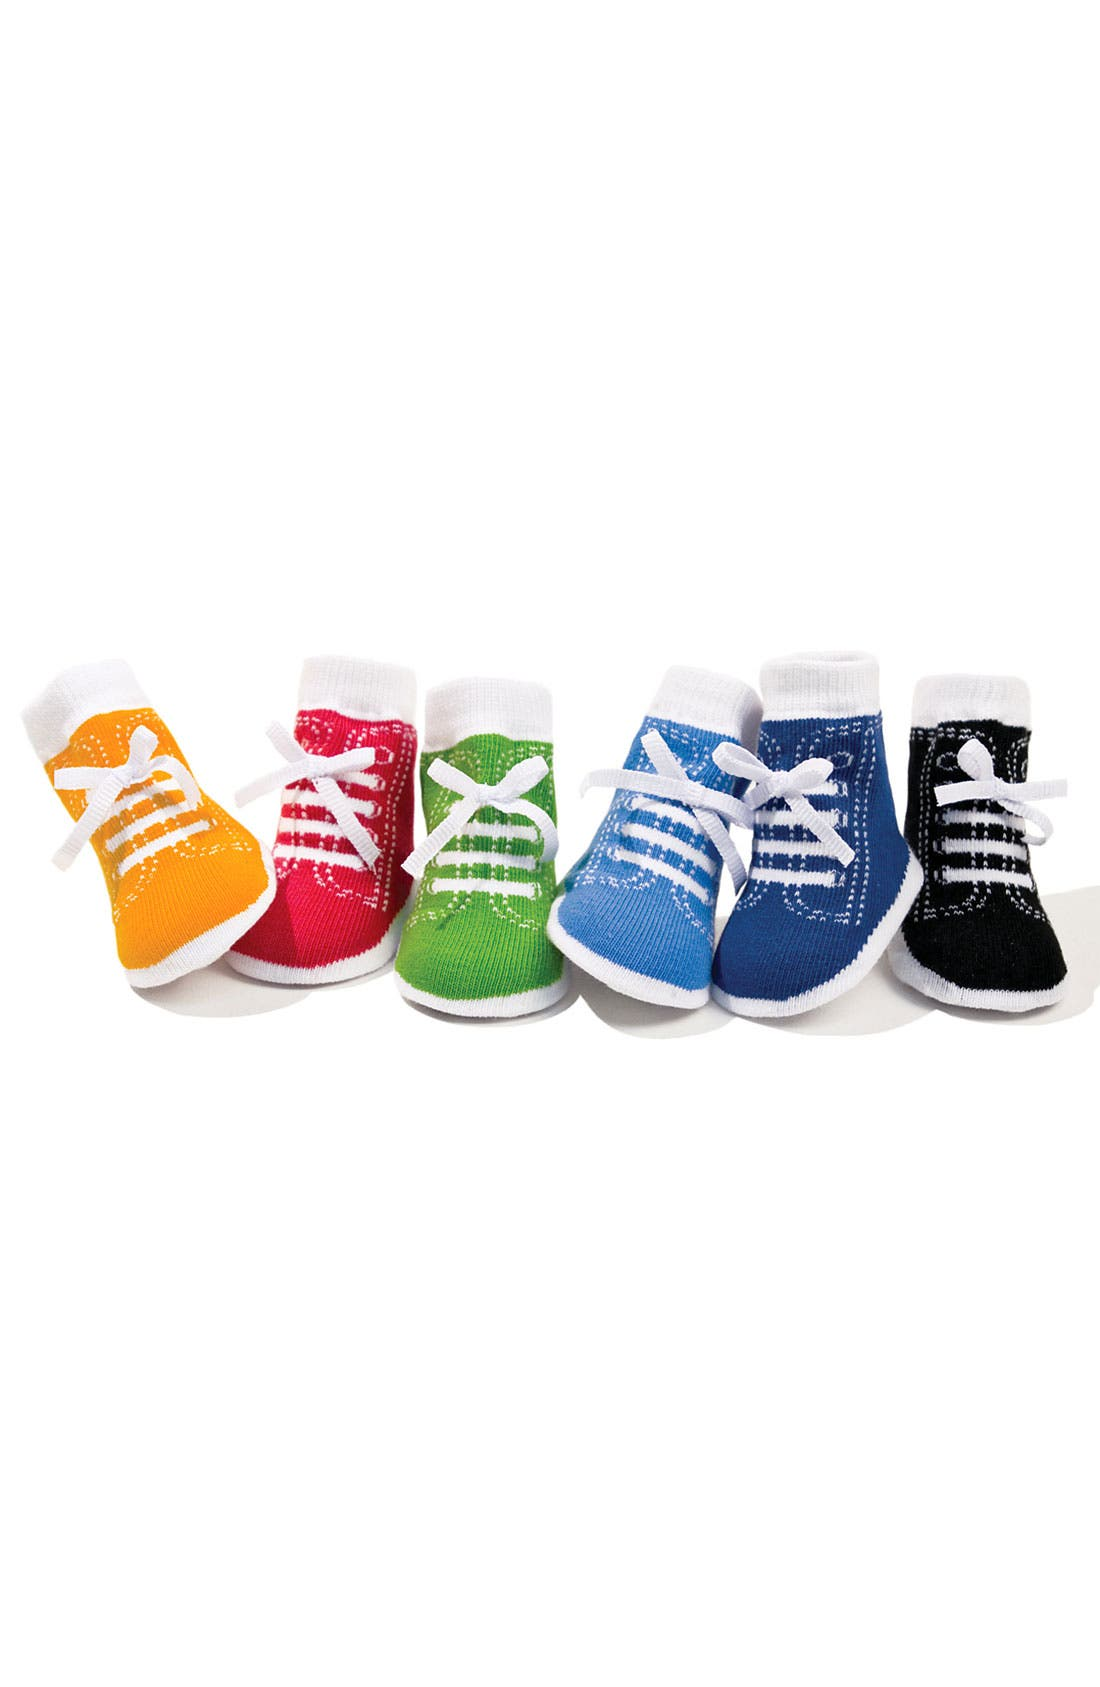 Main Image - Trumpette Socks (Baby Boys)